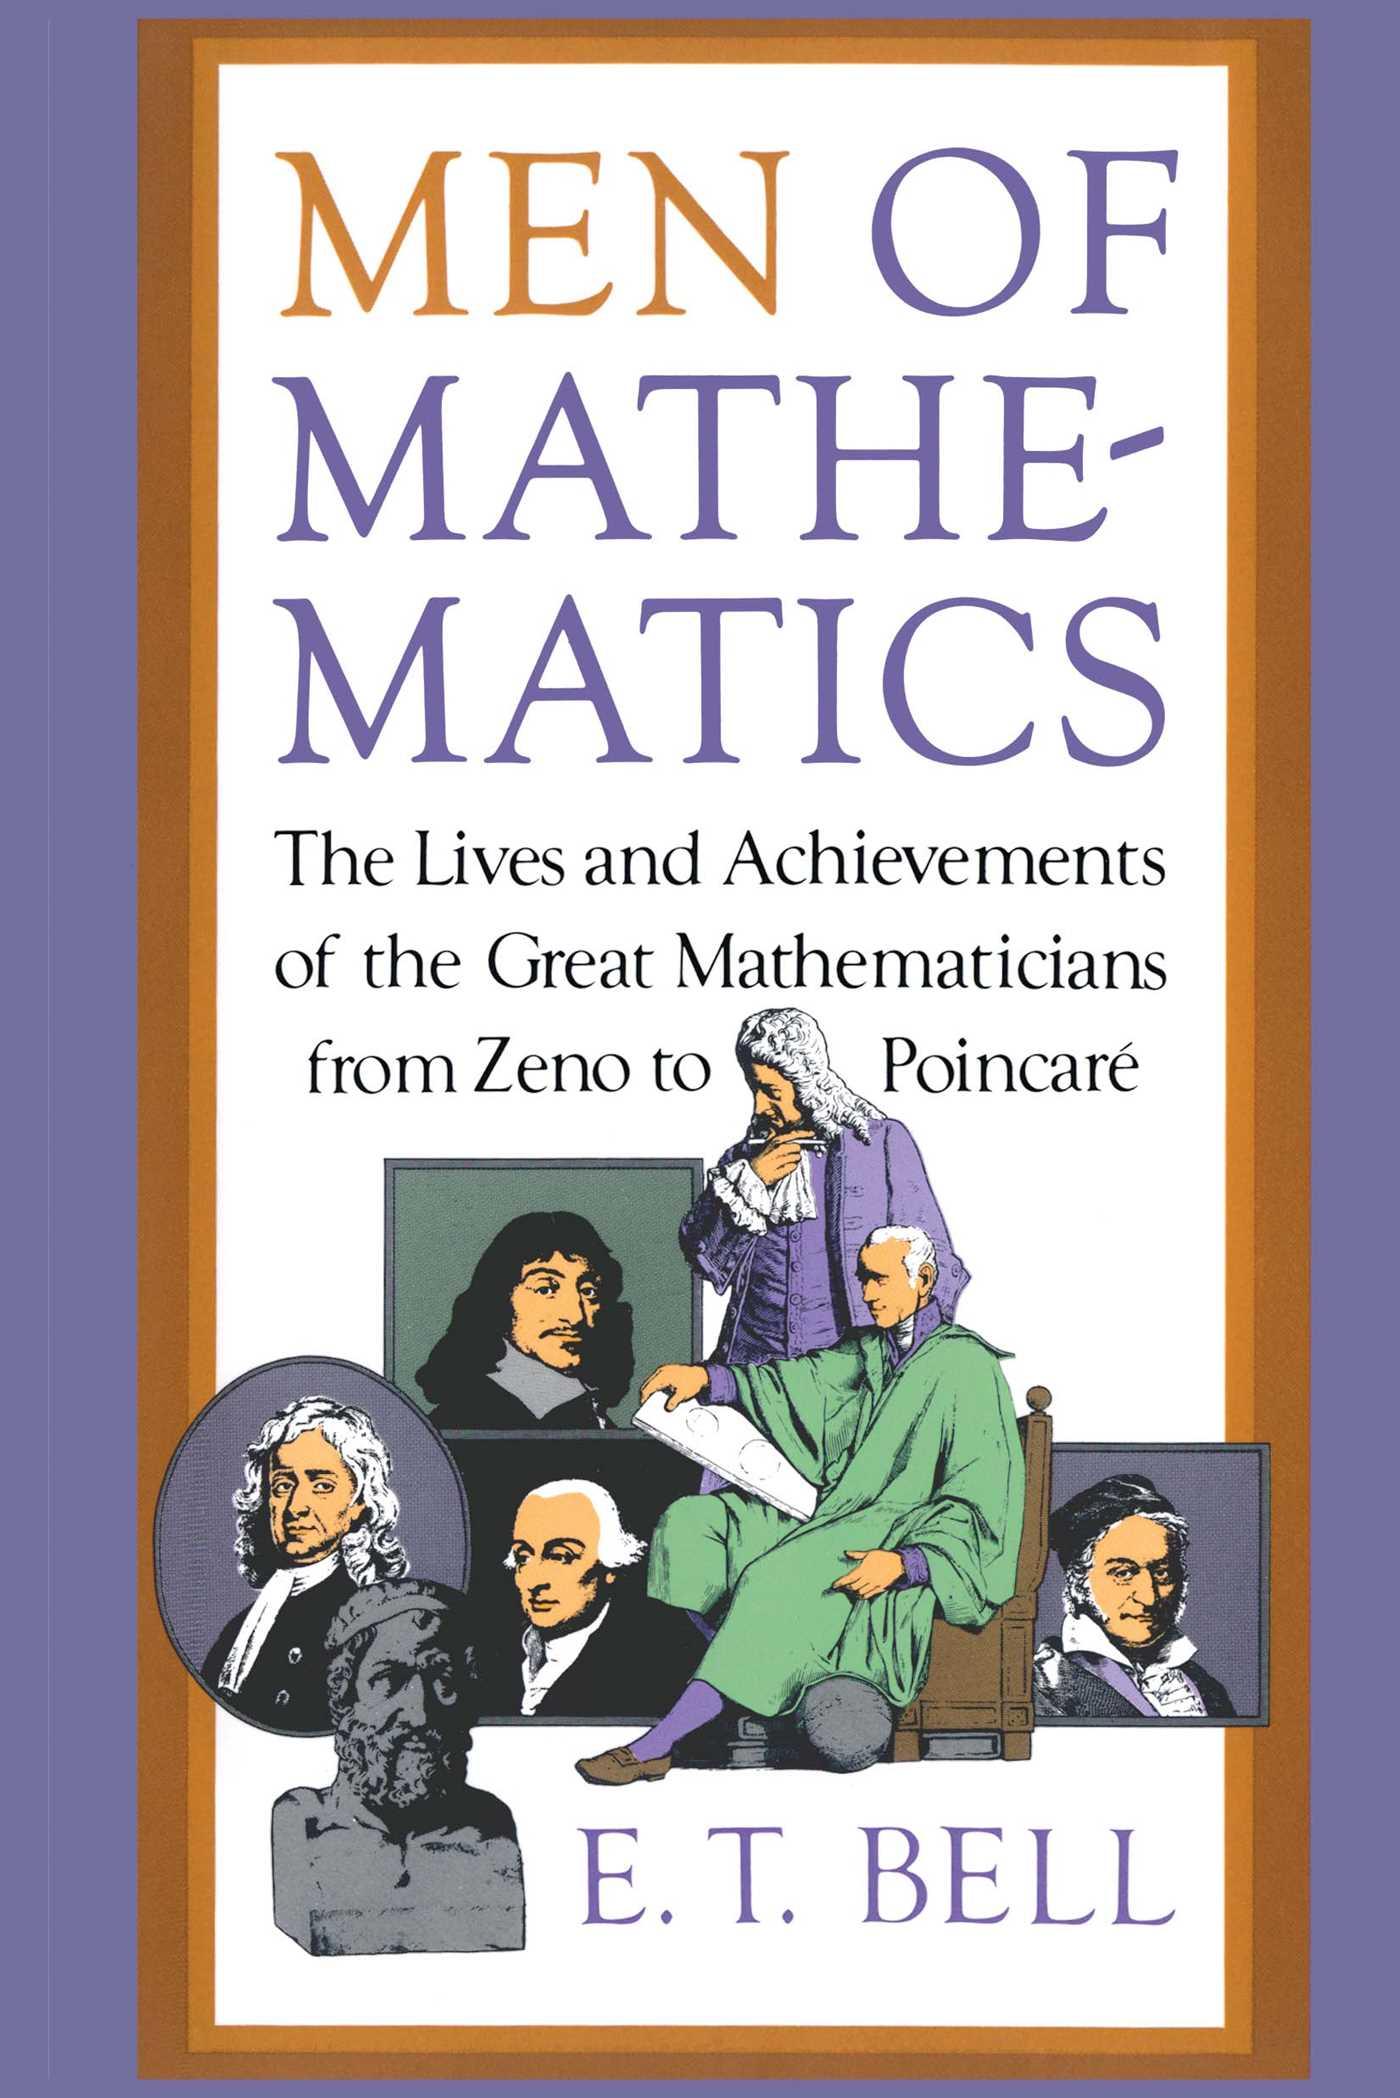 Men of mathematics 9780671628185 hr